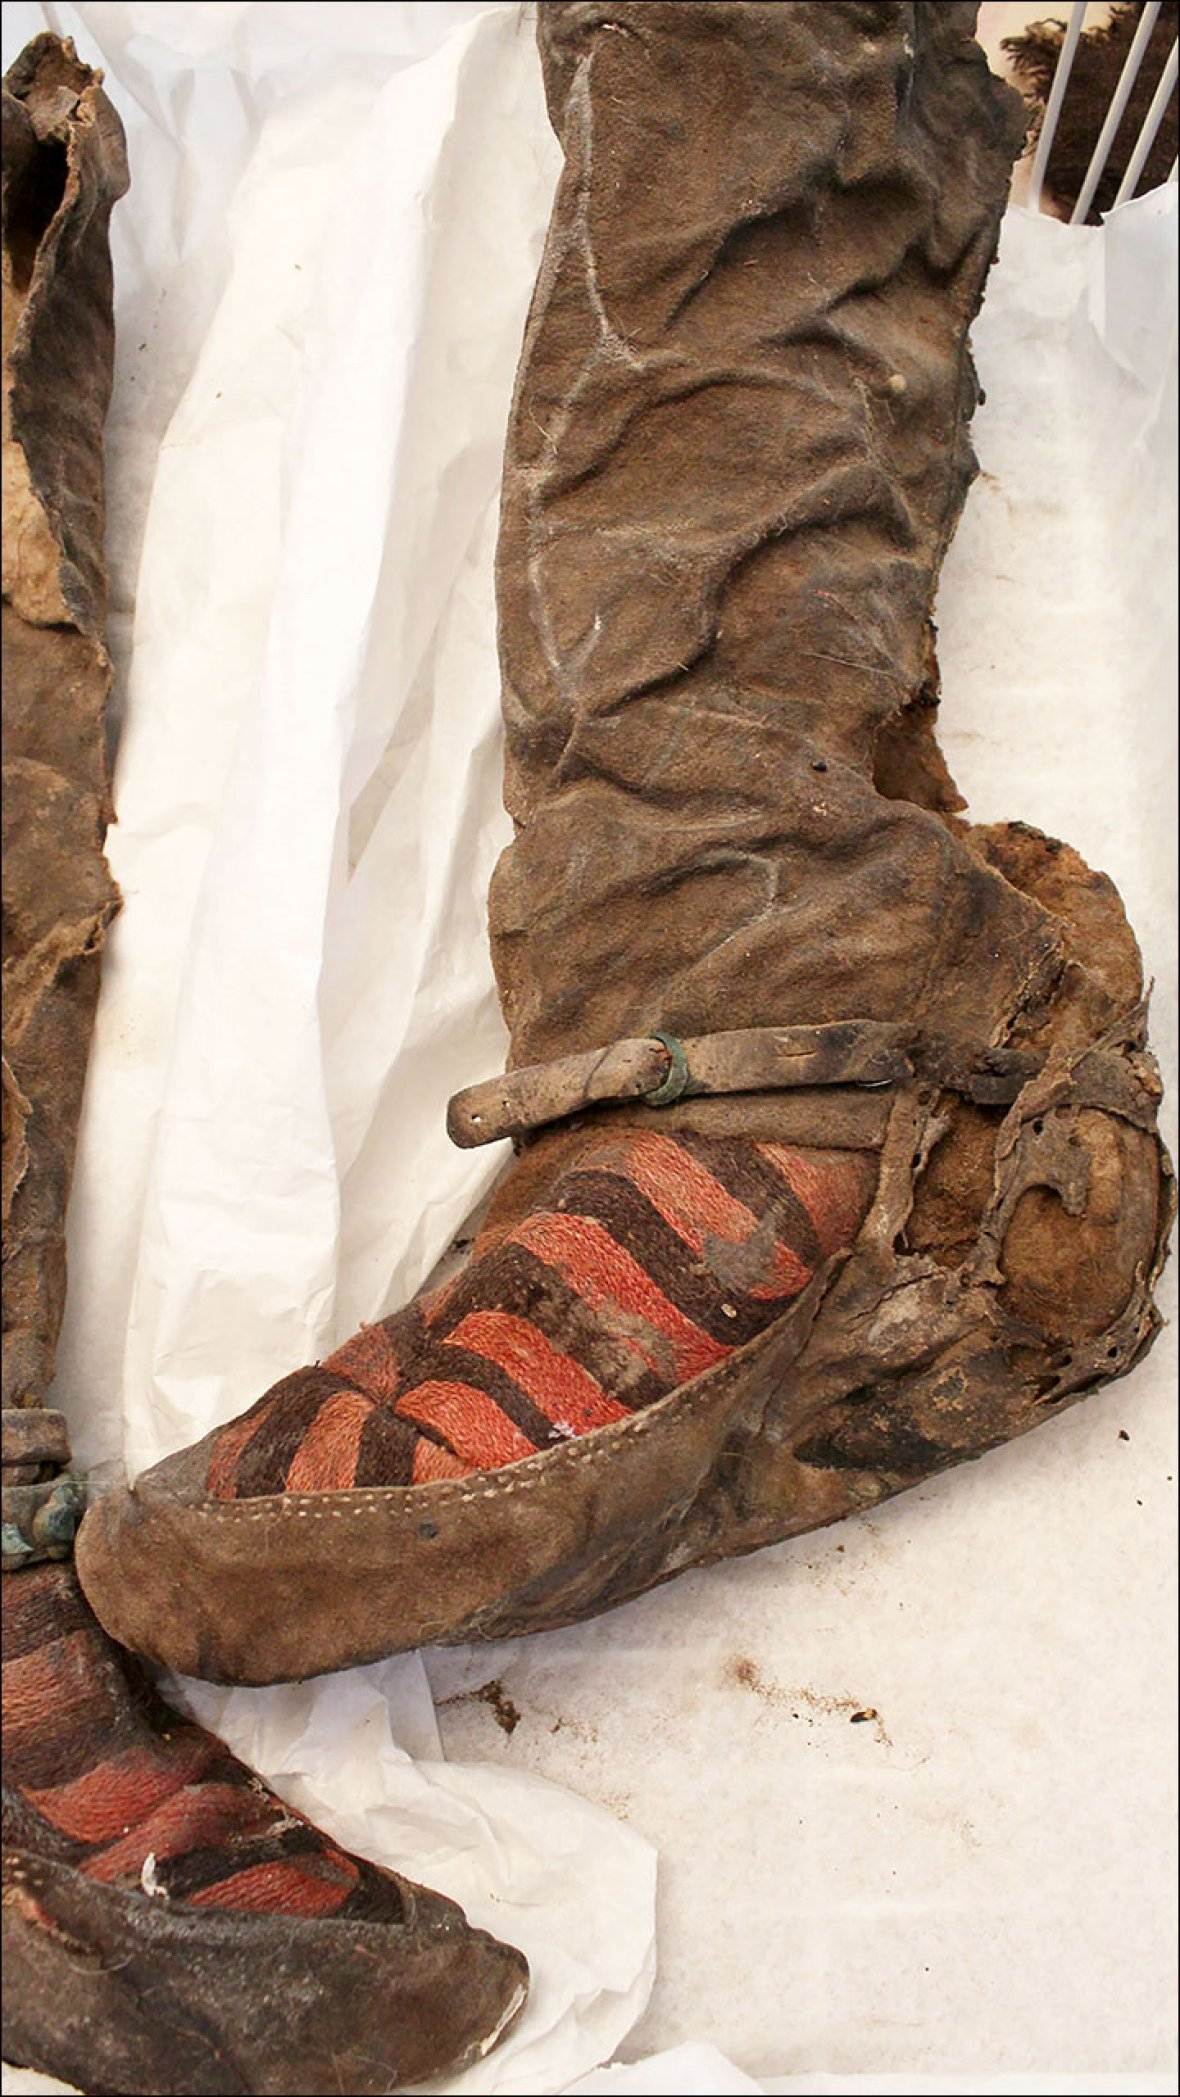 'Adidas' boot